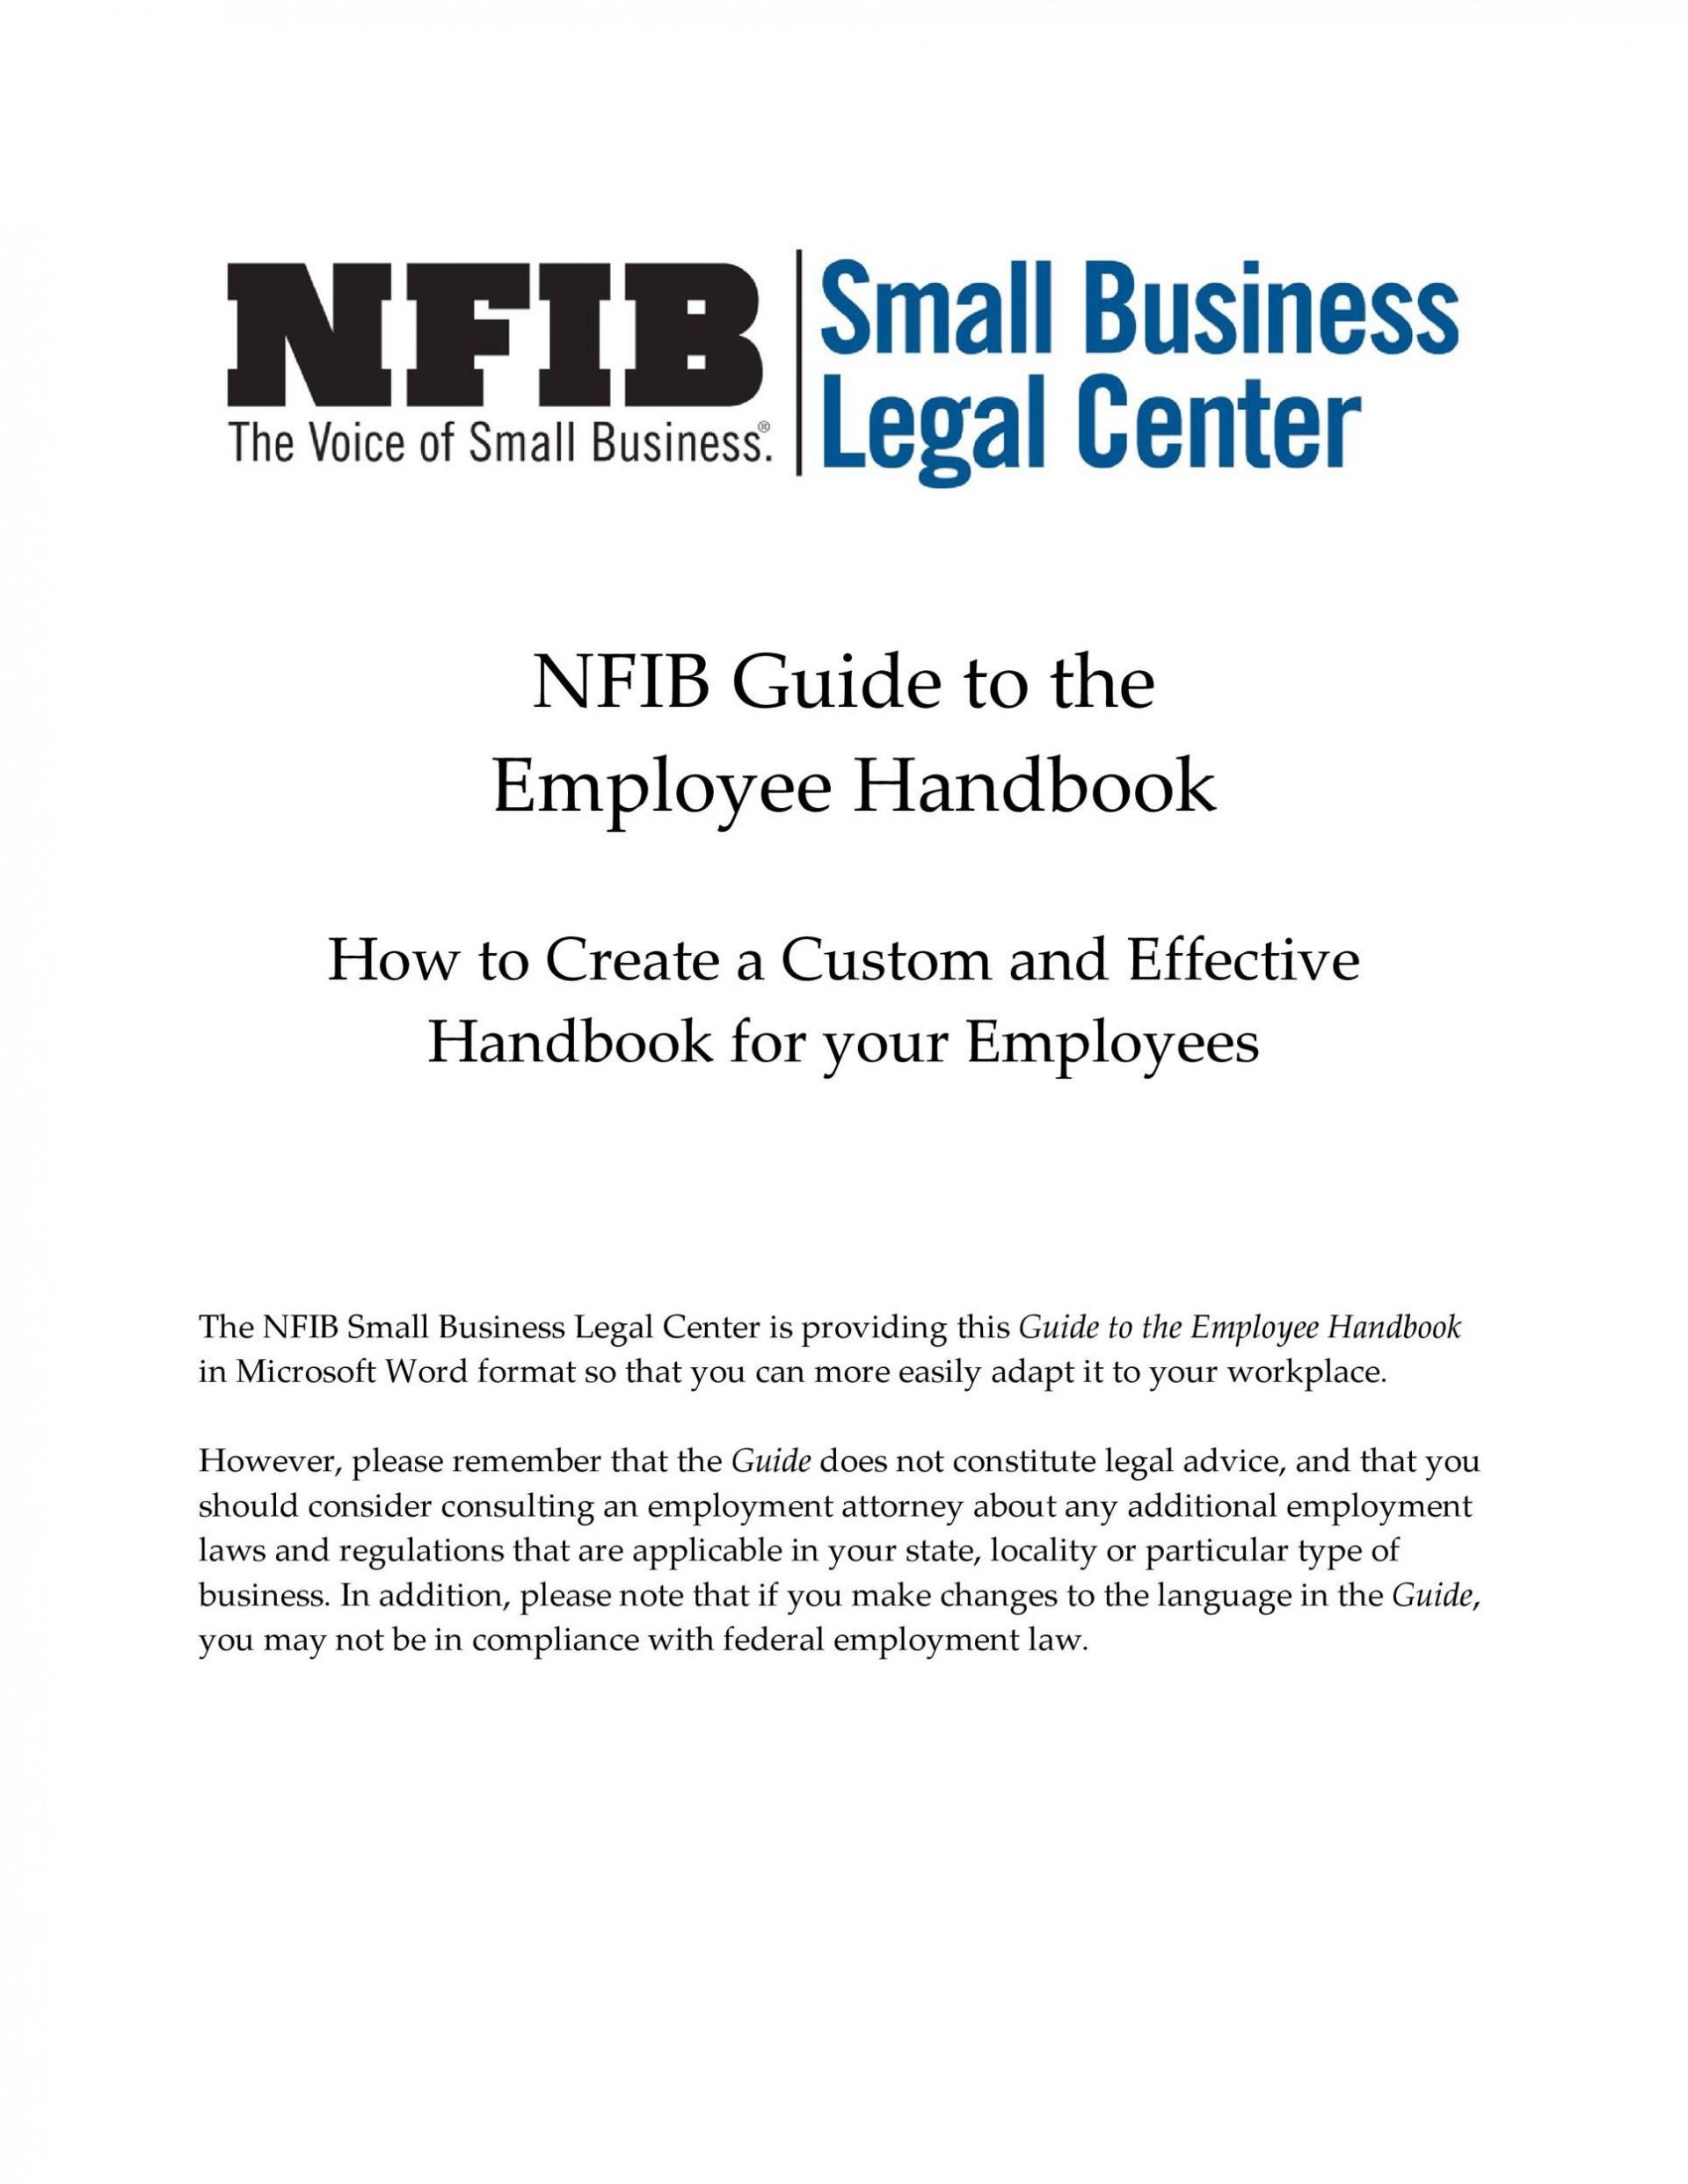 004 Outstanding Free Employee Handbook Template Word High Resolution  Sample In Training Manual1920